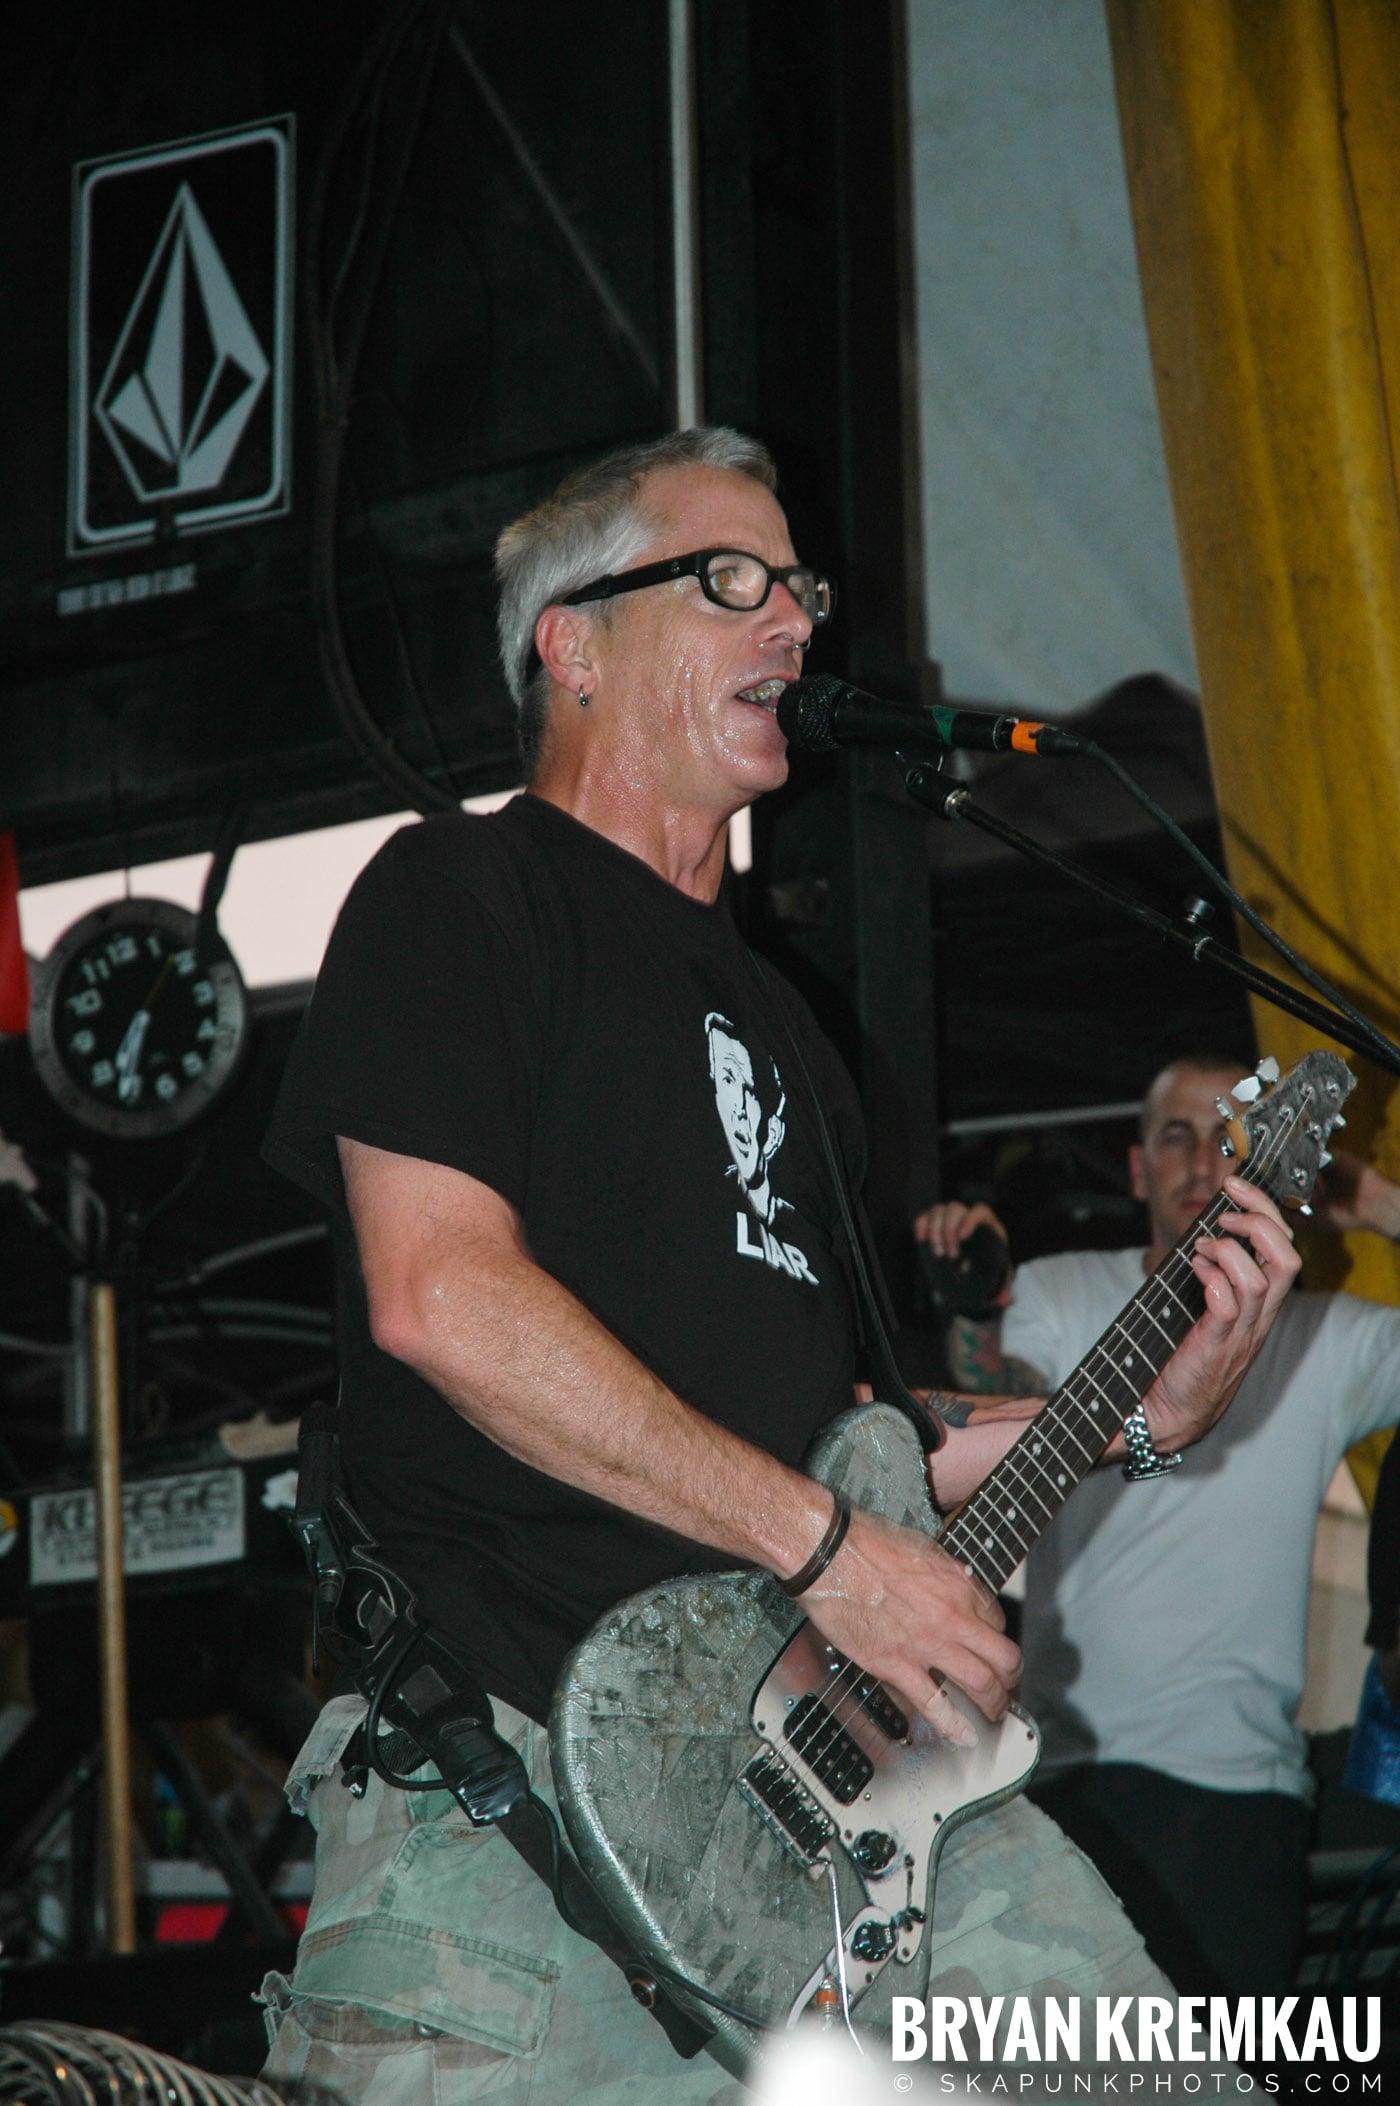 The Offspring @ Warped Tour 05, NYC - 8.12.05 (3)